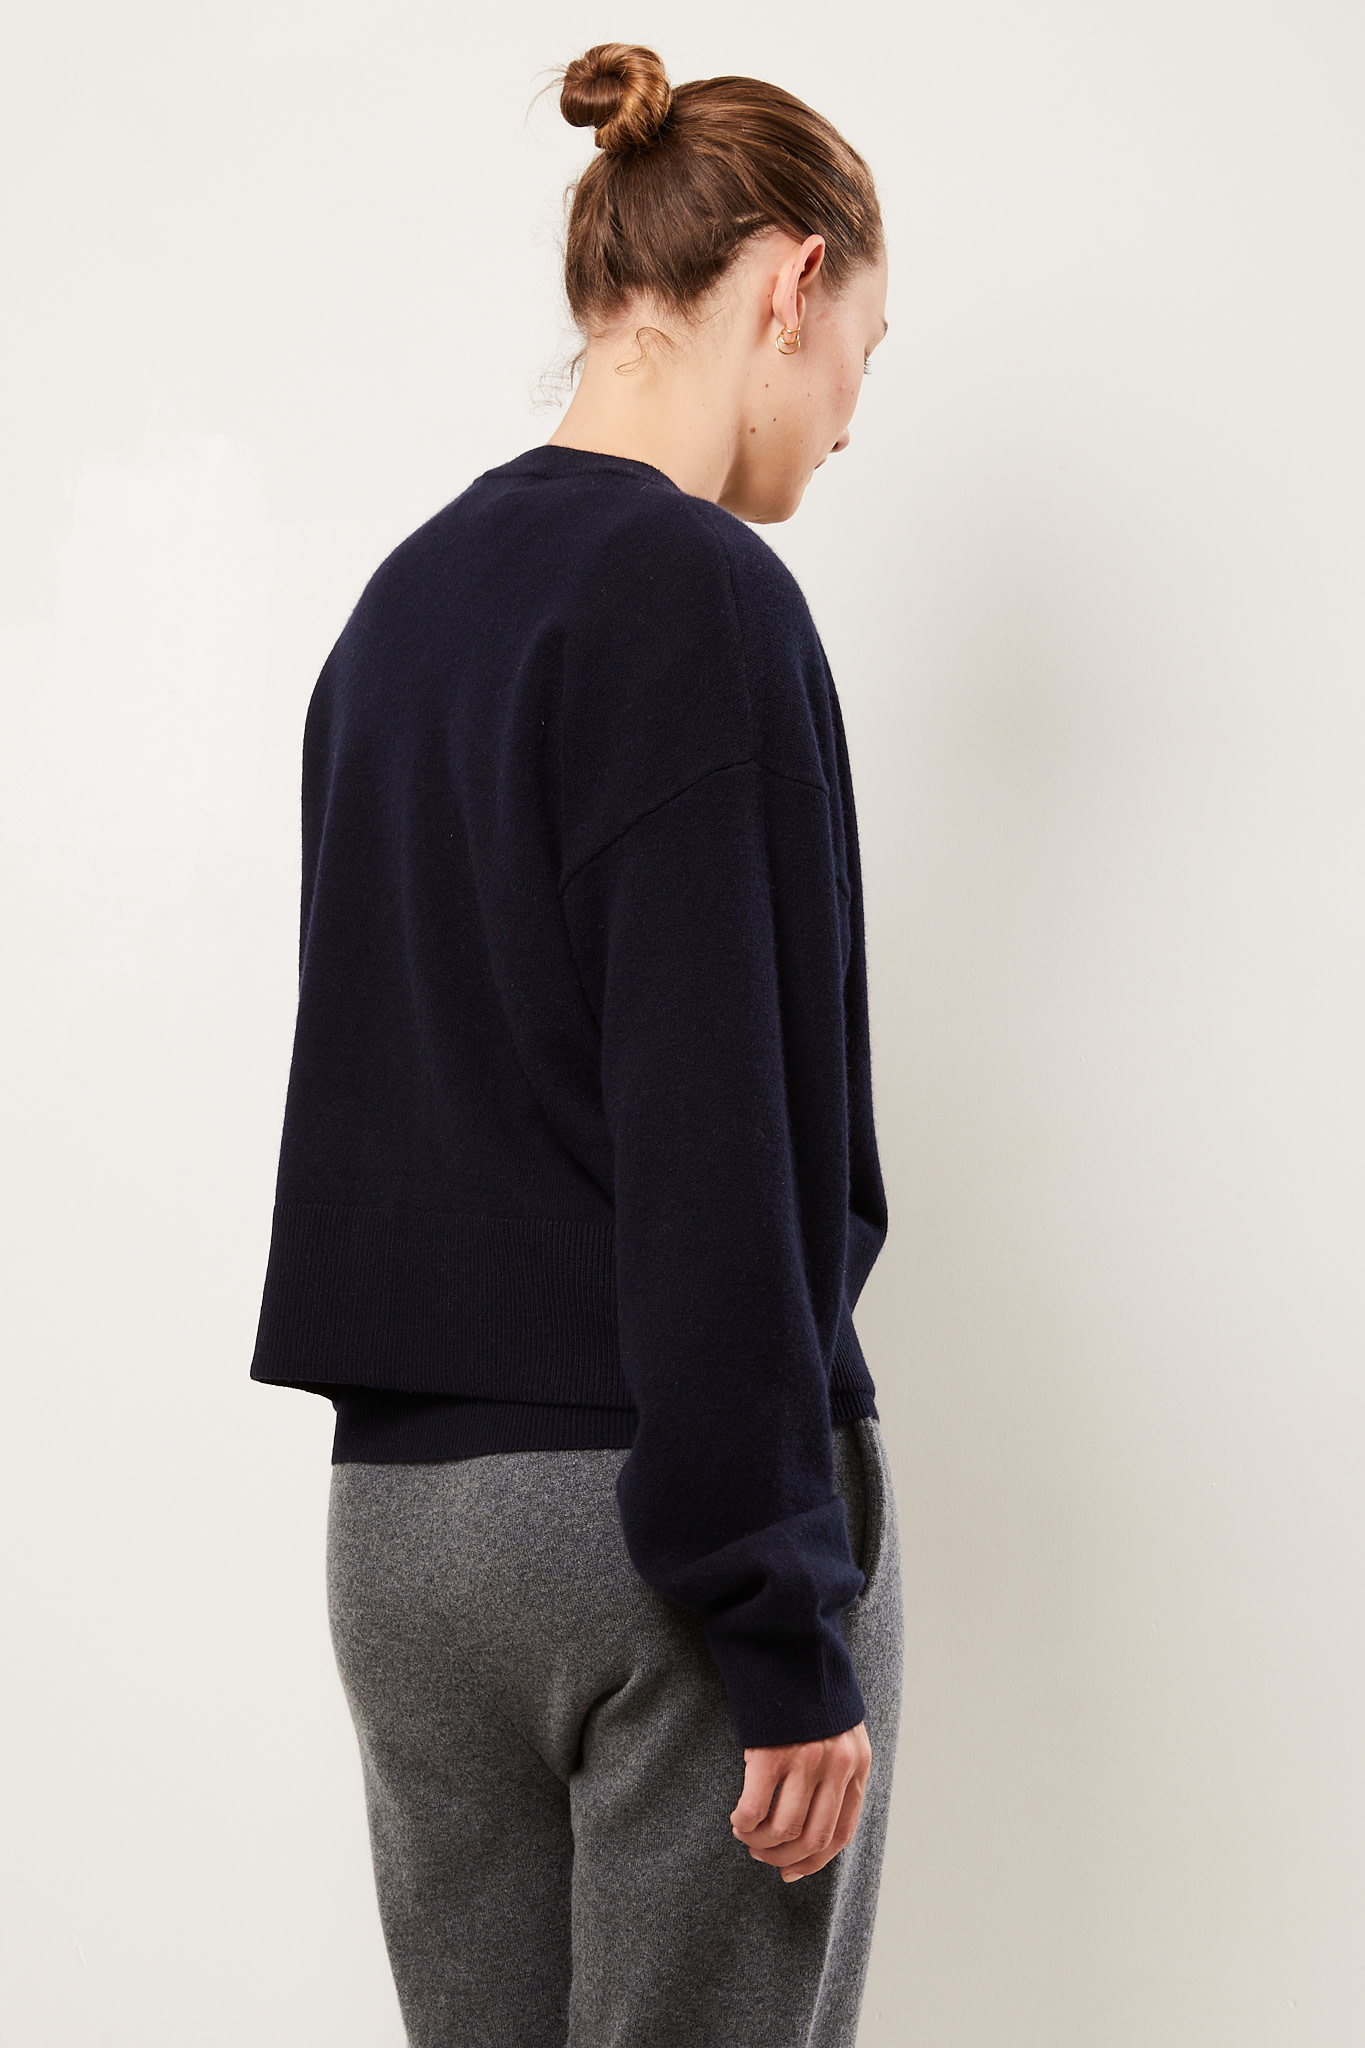 extreme cashmere - Chou cashmere cardigan